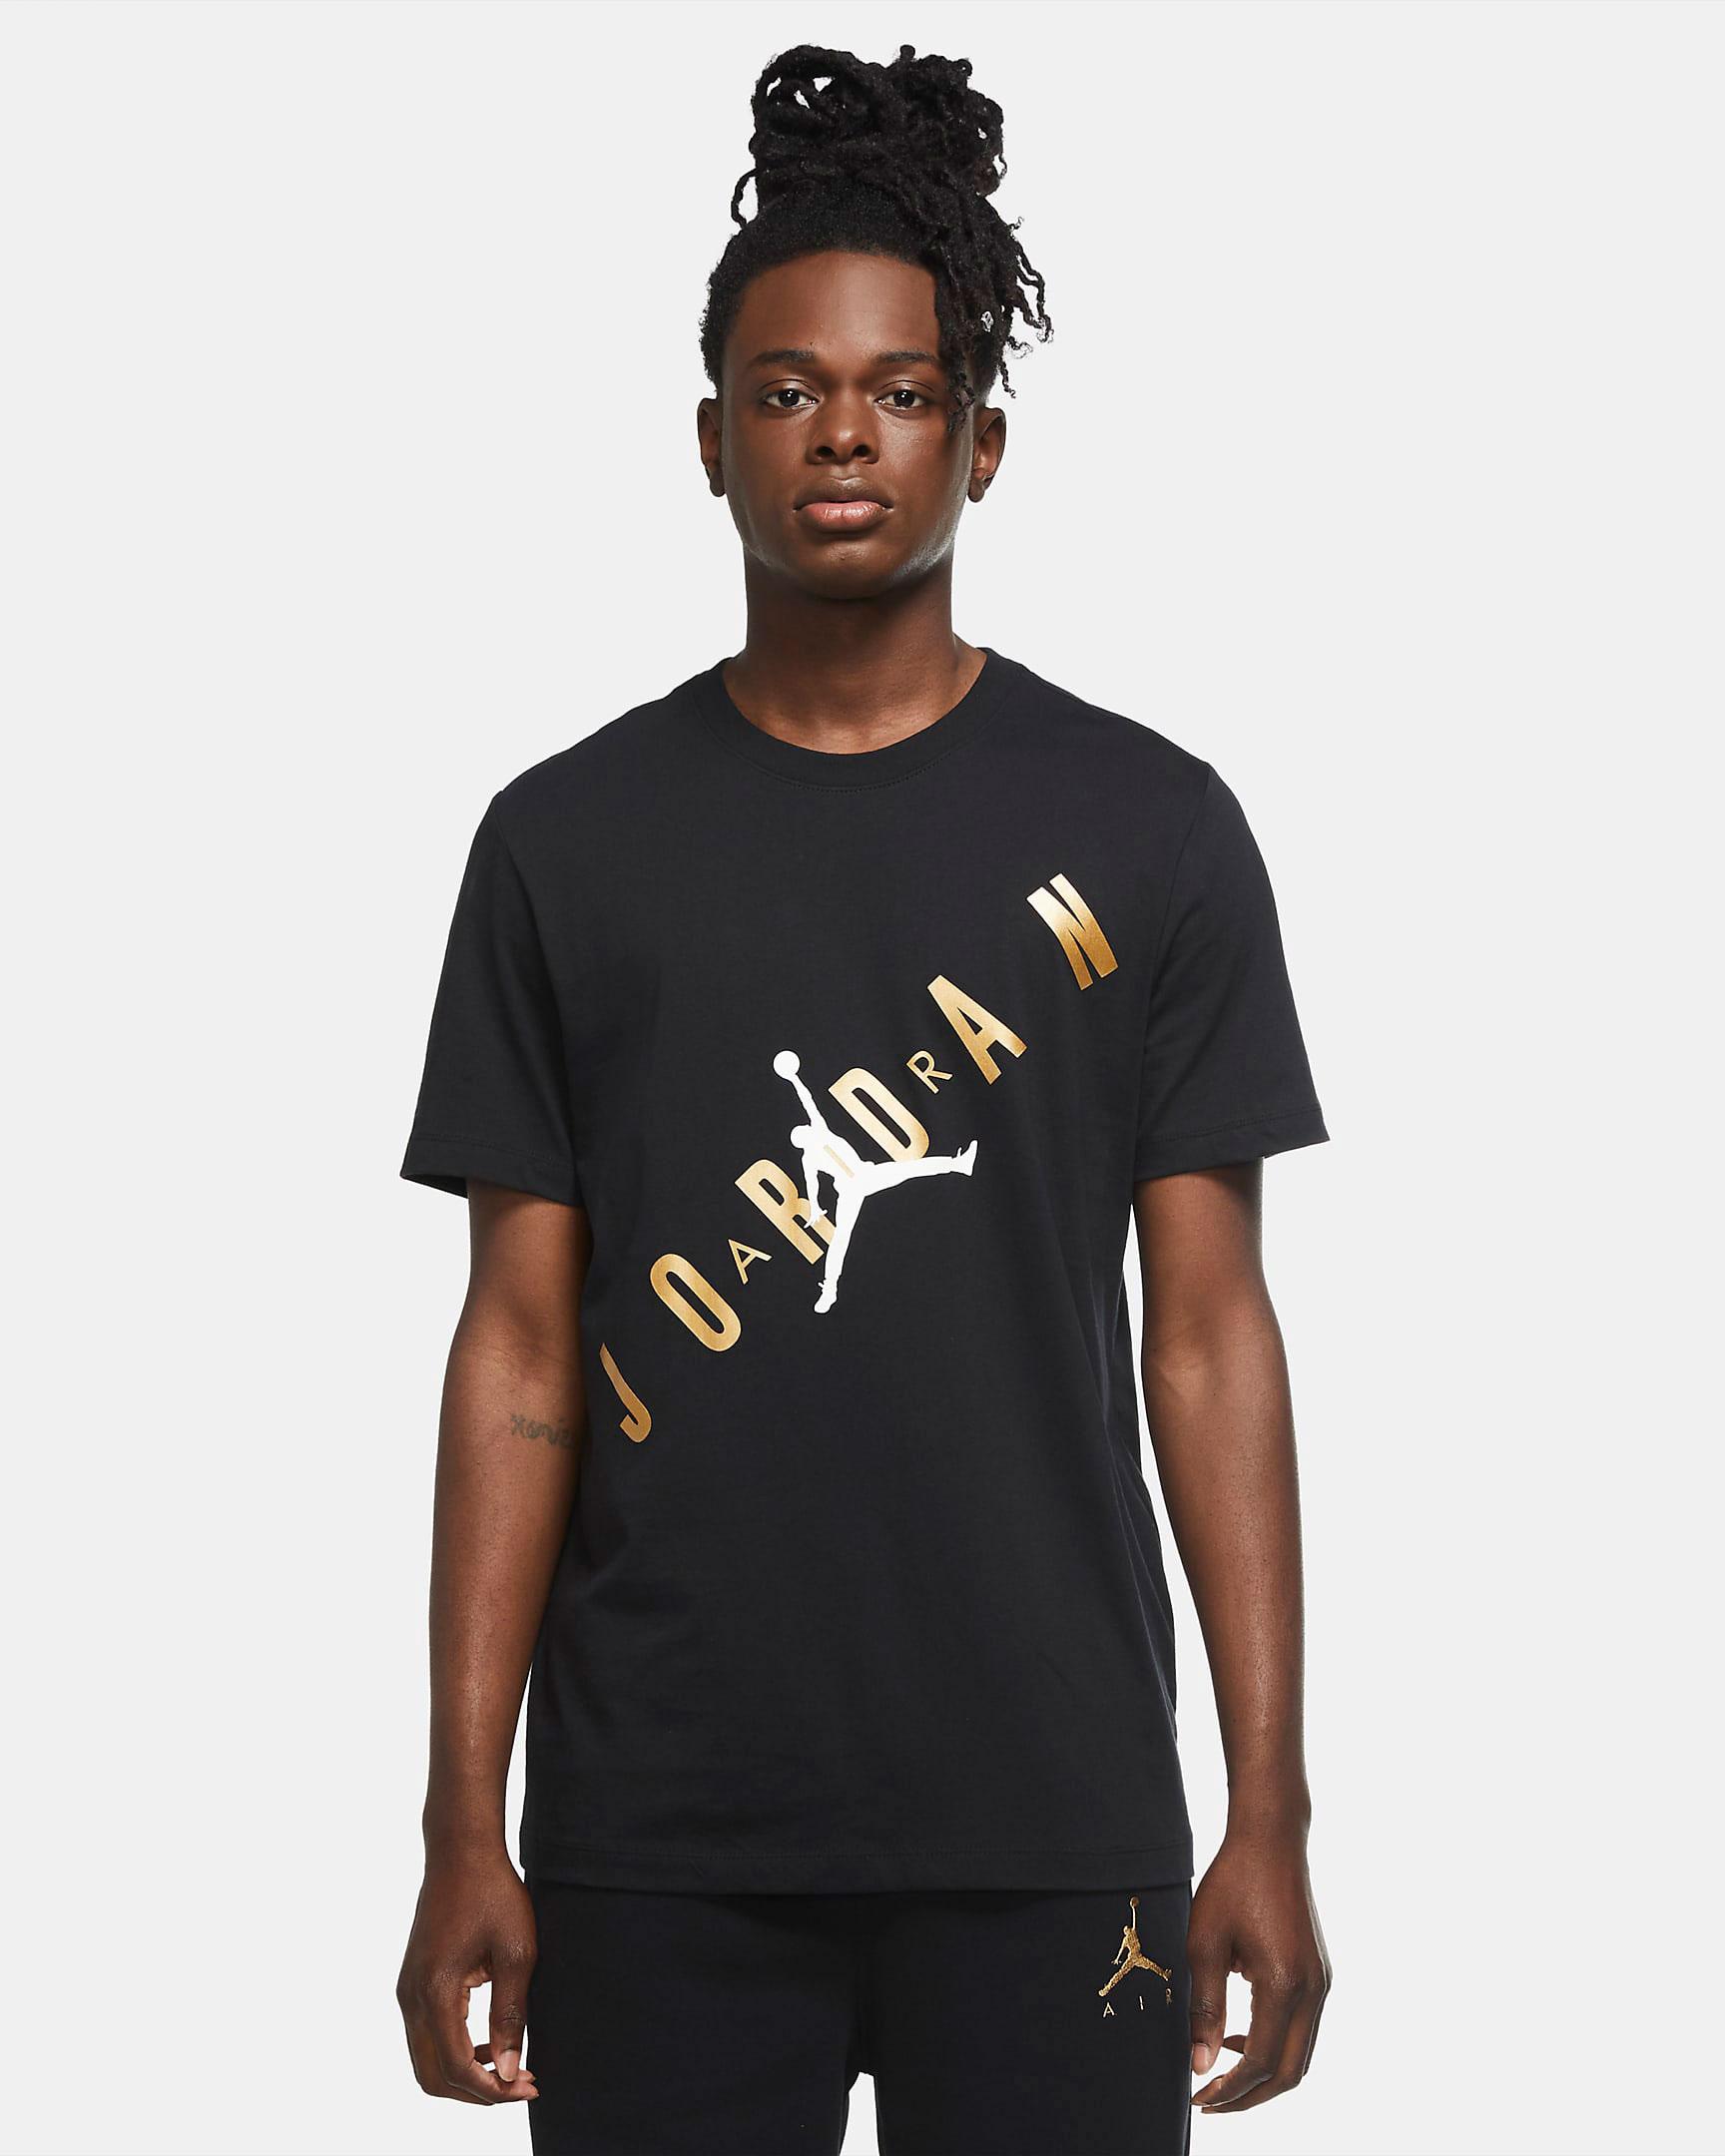 jordan-dmp-hbr-shirt-black-gold